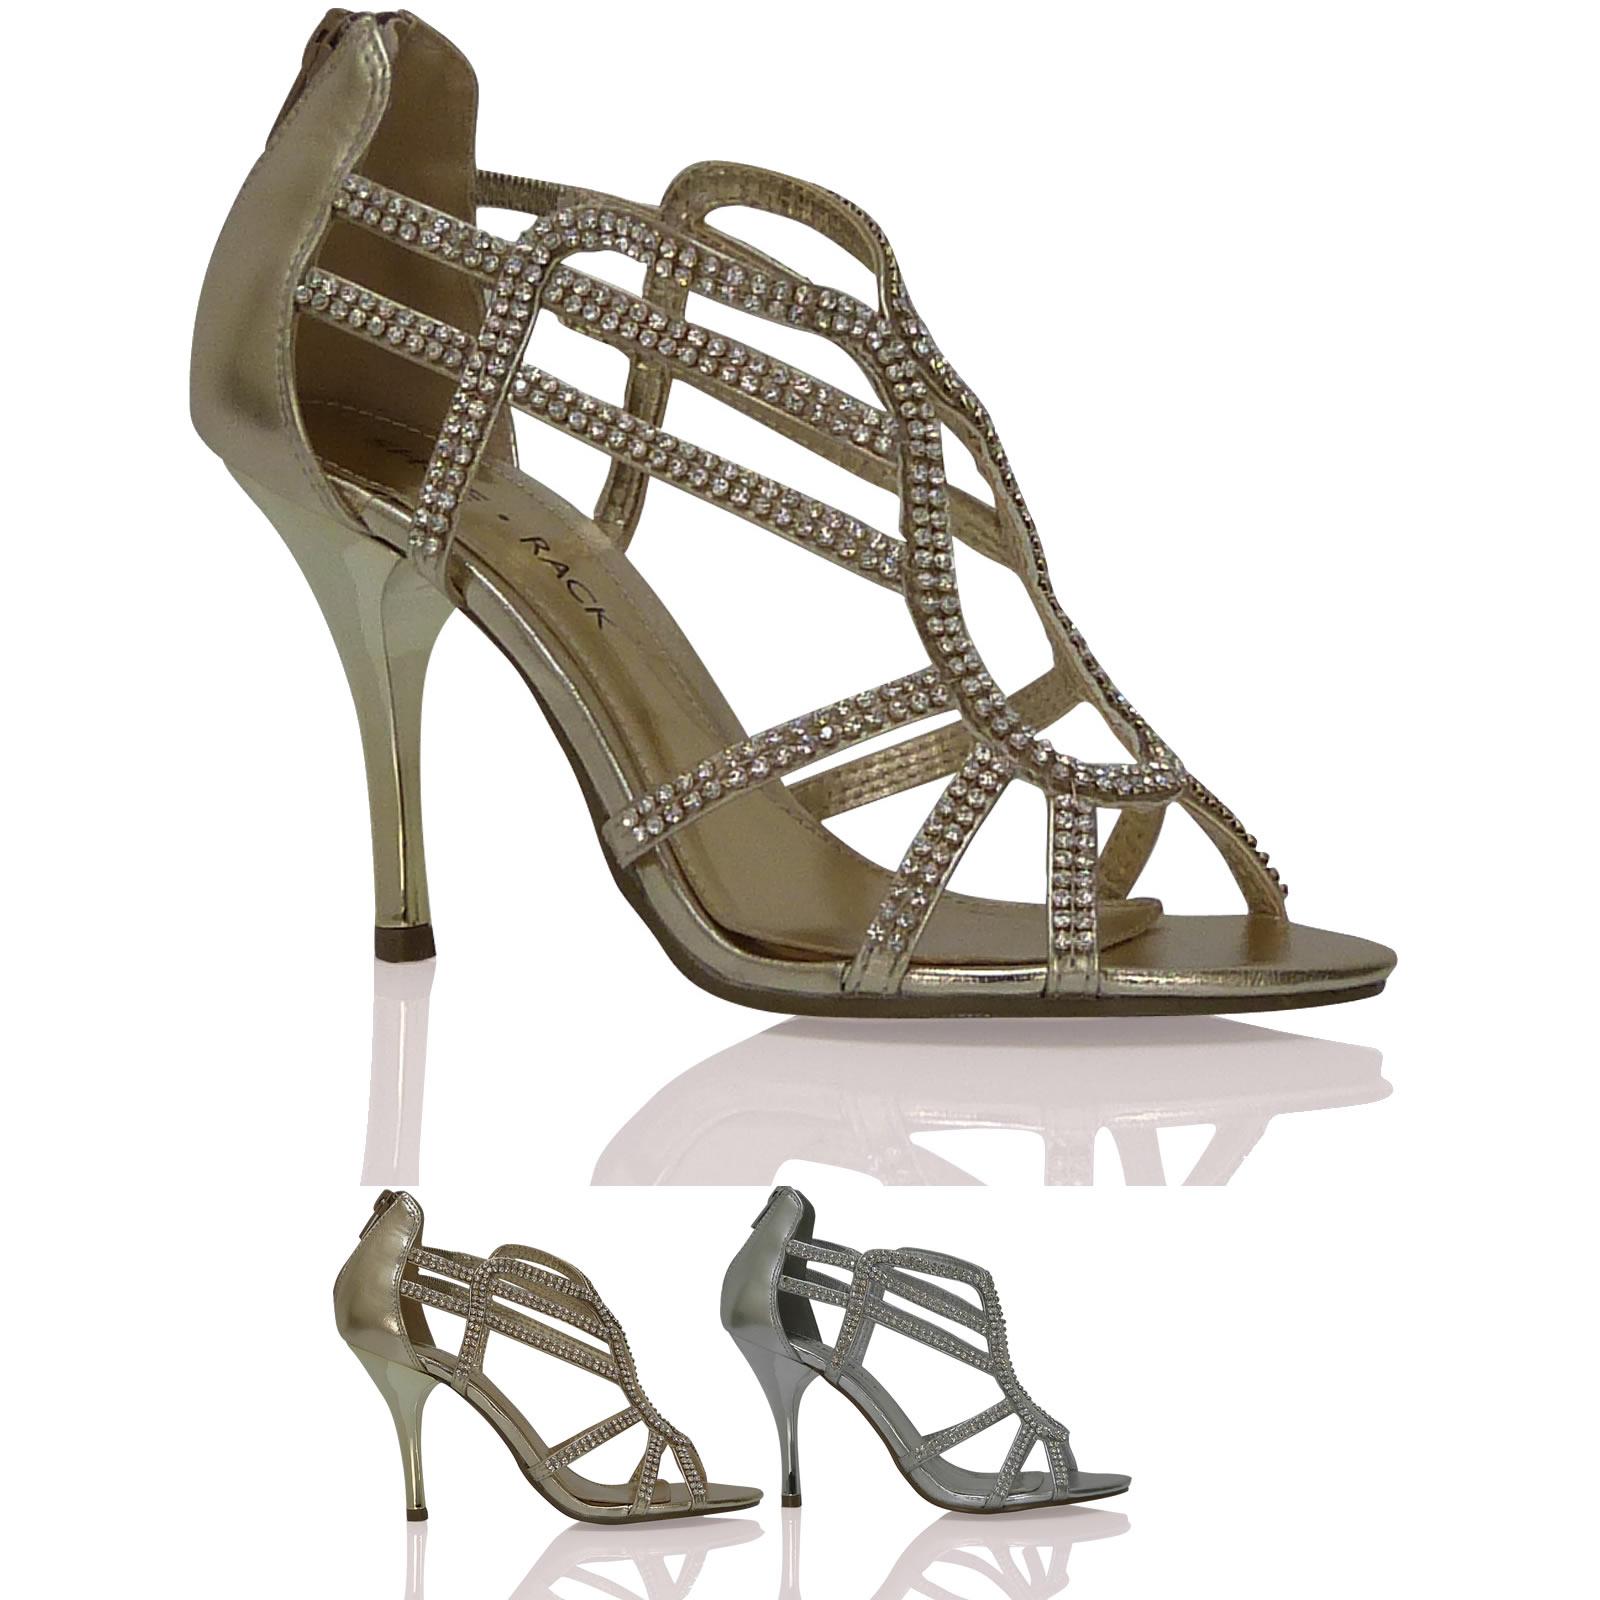 damen sandalen riemchen party hoher absatz strass k fig rei verschluss schuhe ebay. Black Bedroom Furniture Sets. Home Design Ideas